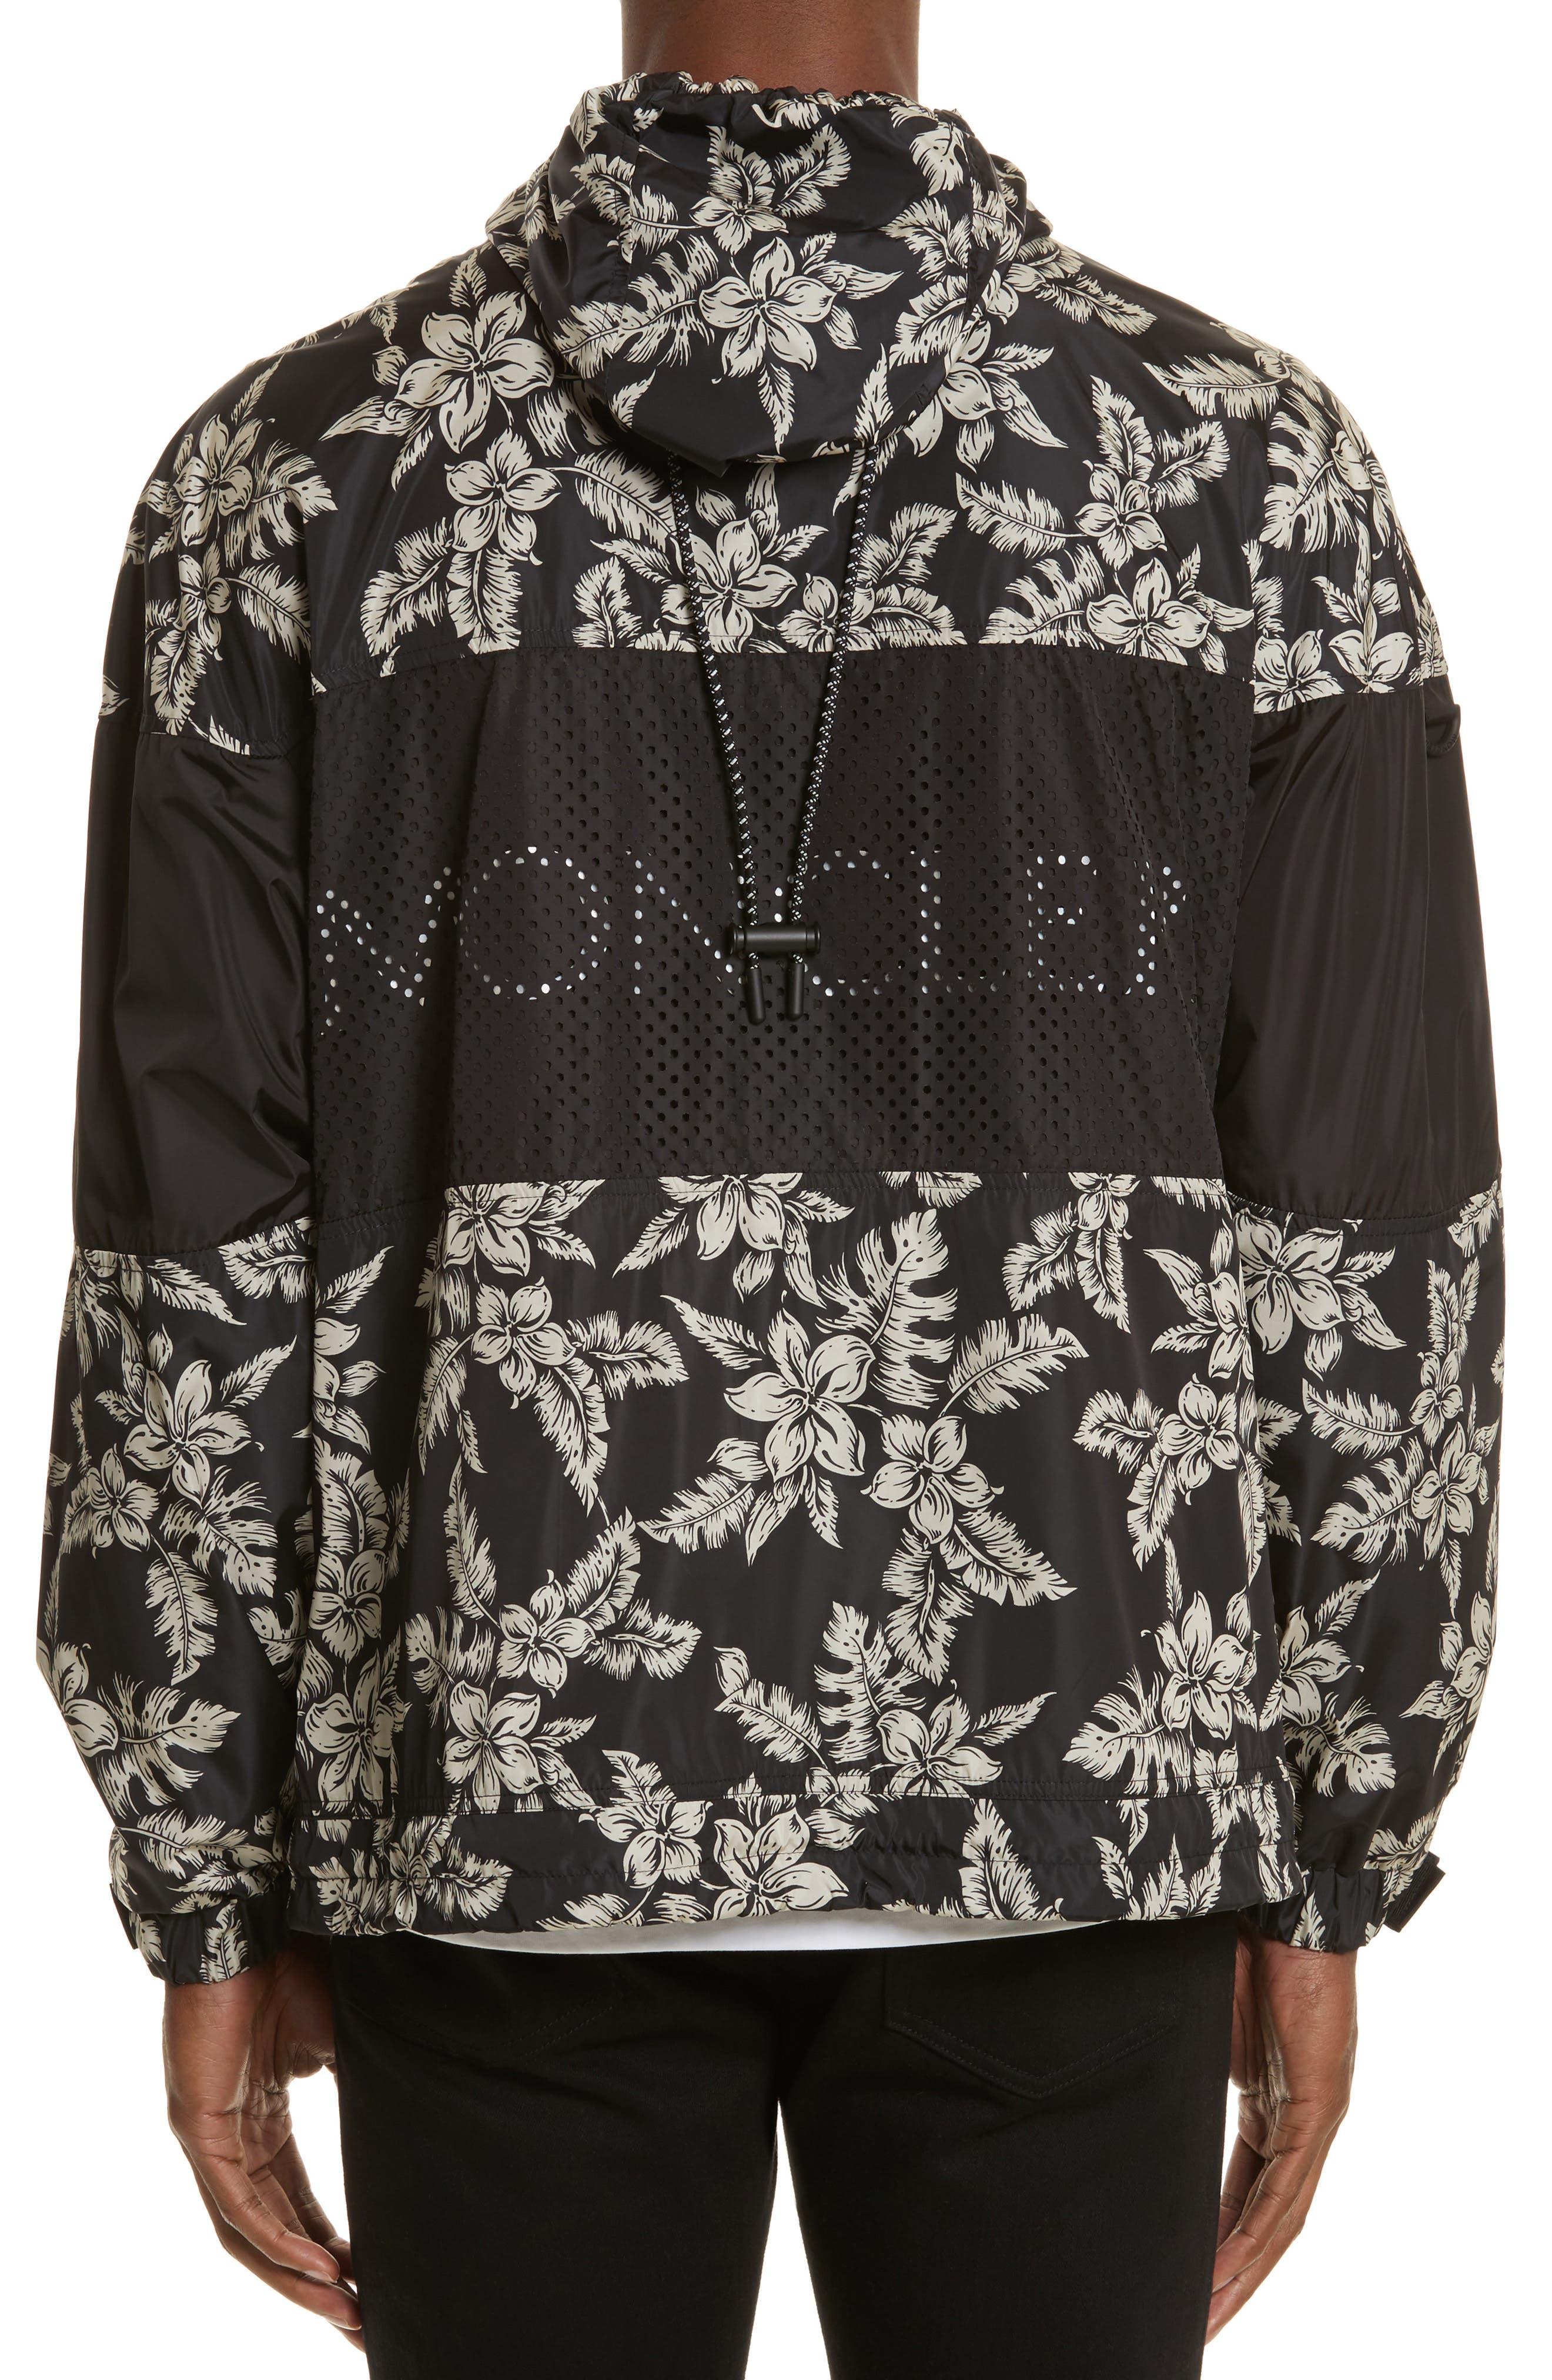 Thiou Floral Print Jacket,                             Alternate thumbnail 2, color,                             BLACK